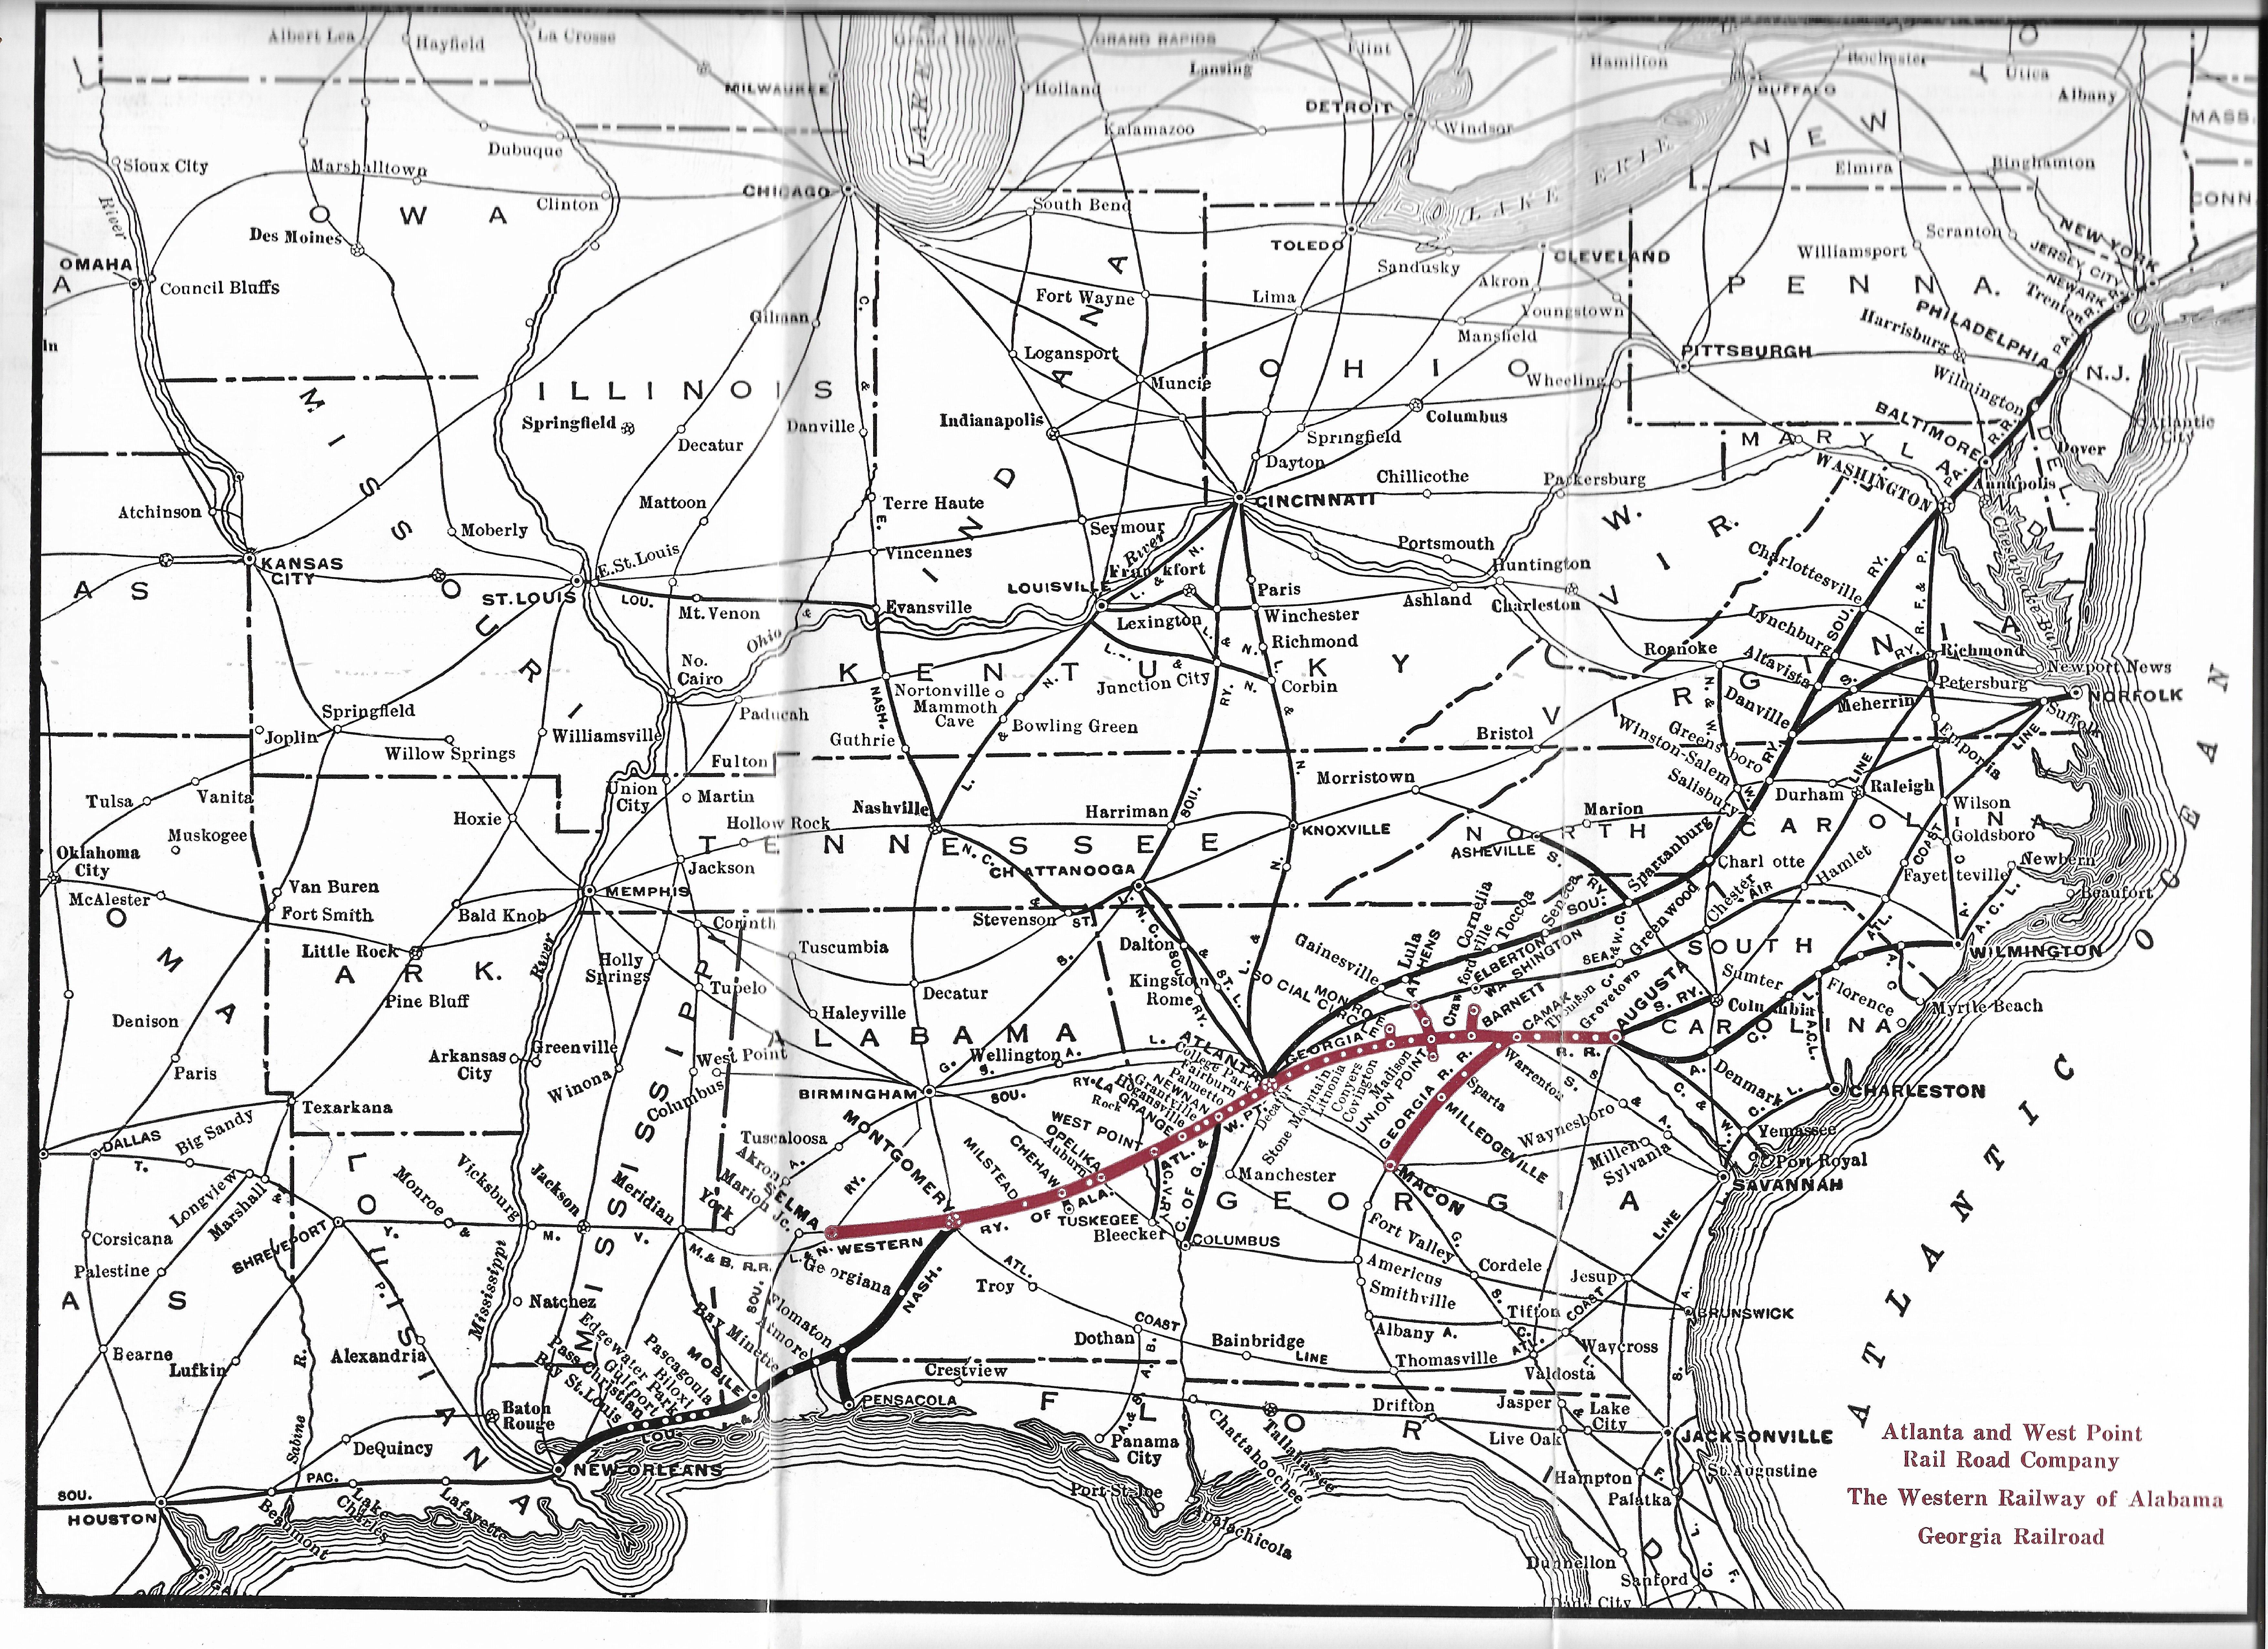 Railroad Map Of Georgia.1965 Map Of Atlanta And West Point Railroad Georgia Railroad And